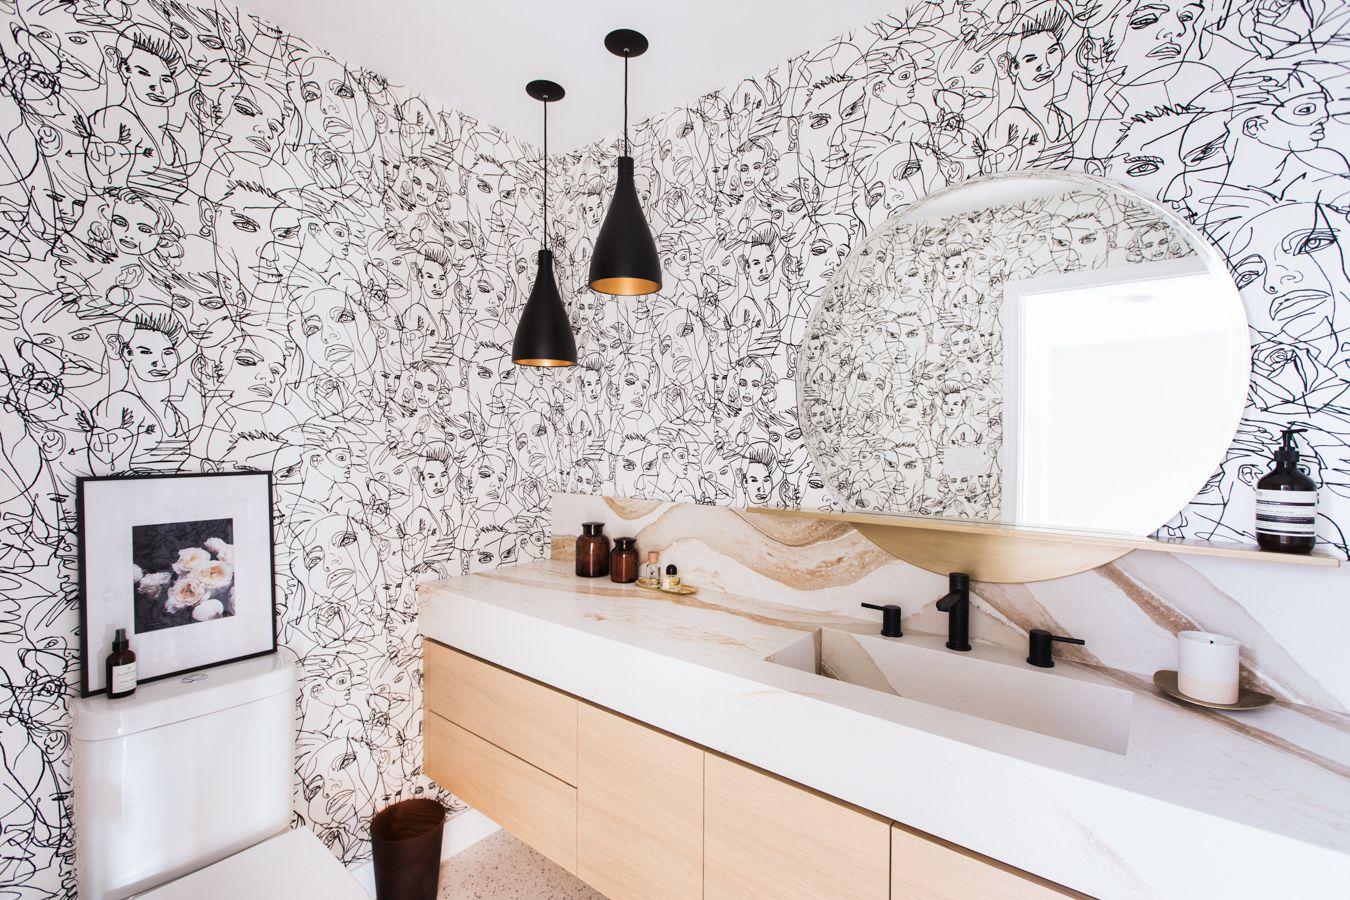 20 Stylish Ways To Decorate Your Bathroom Walls